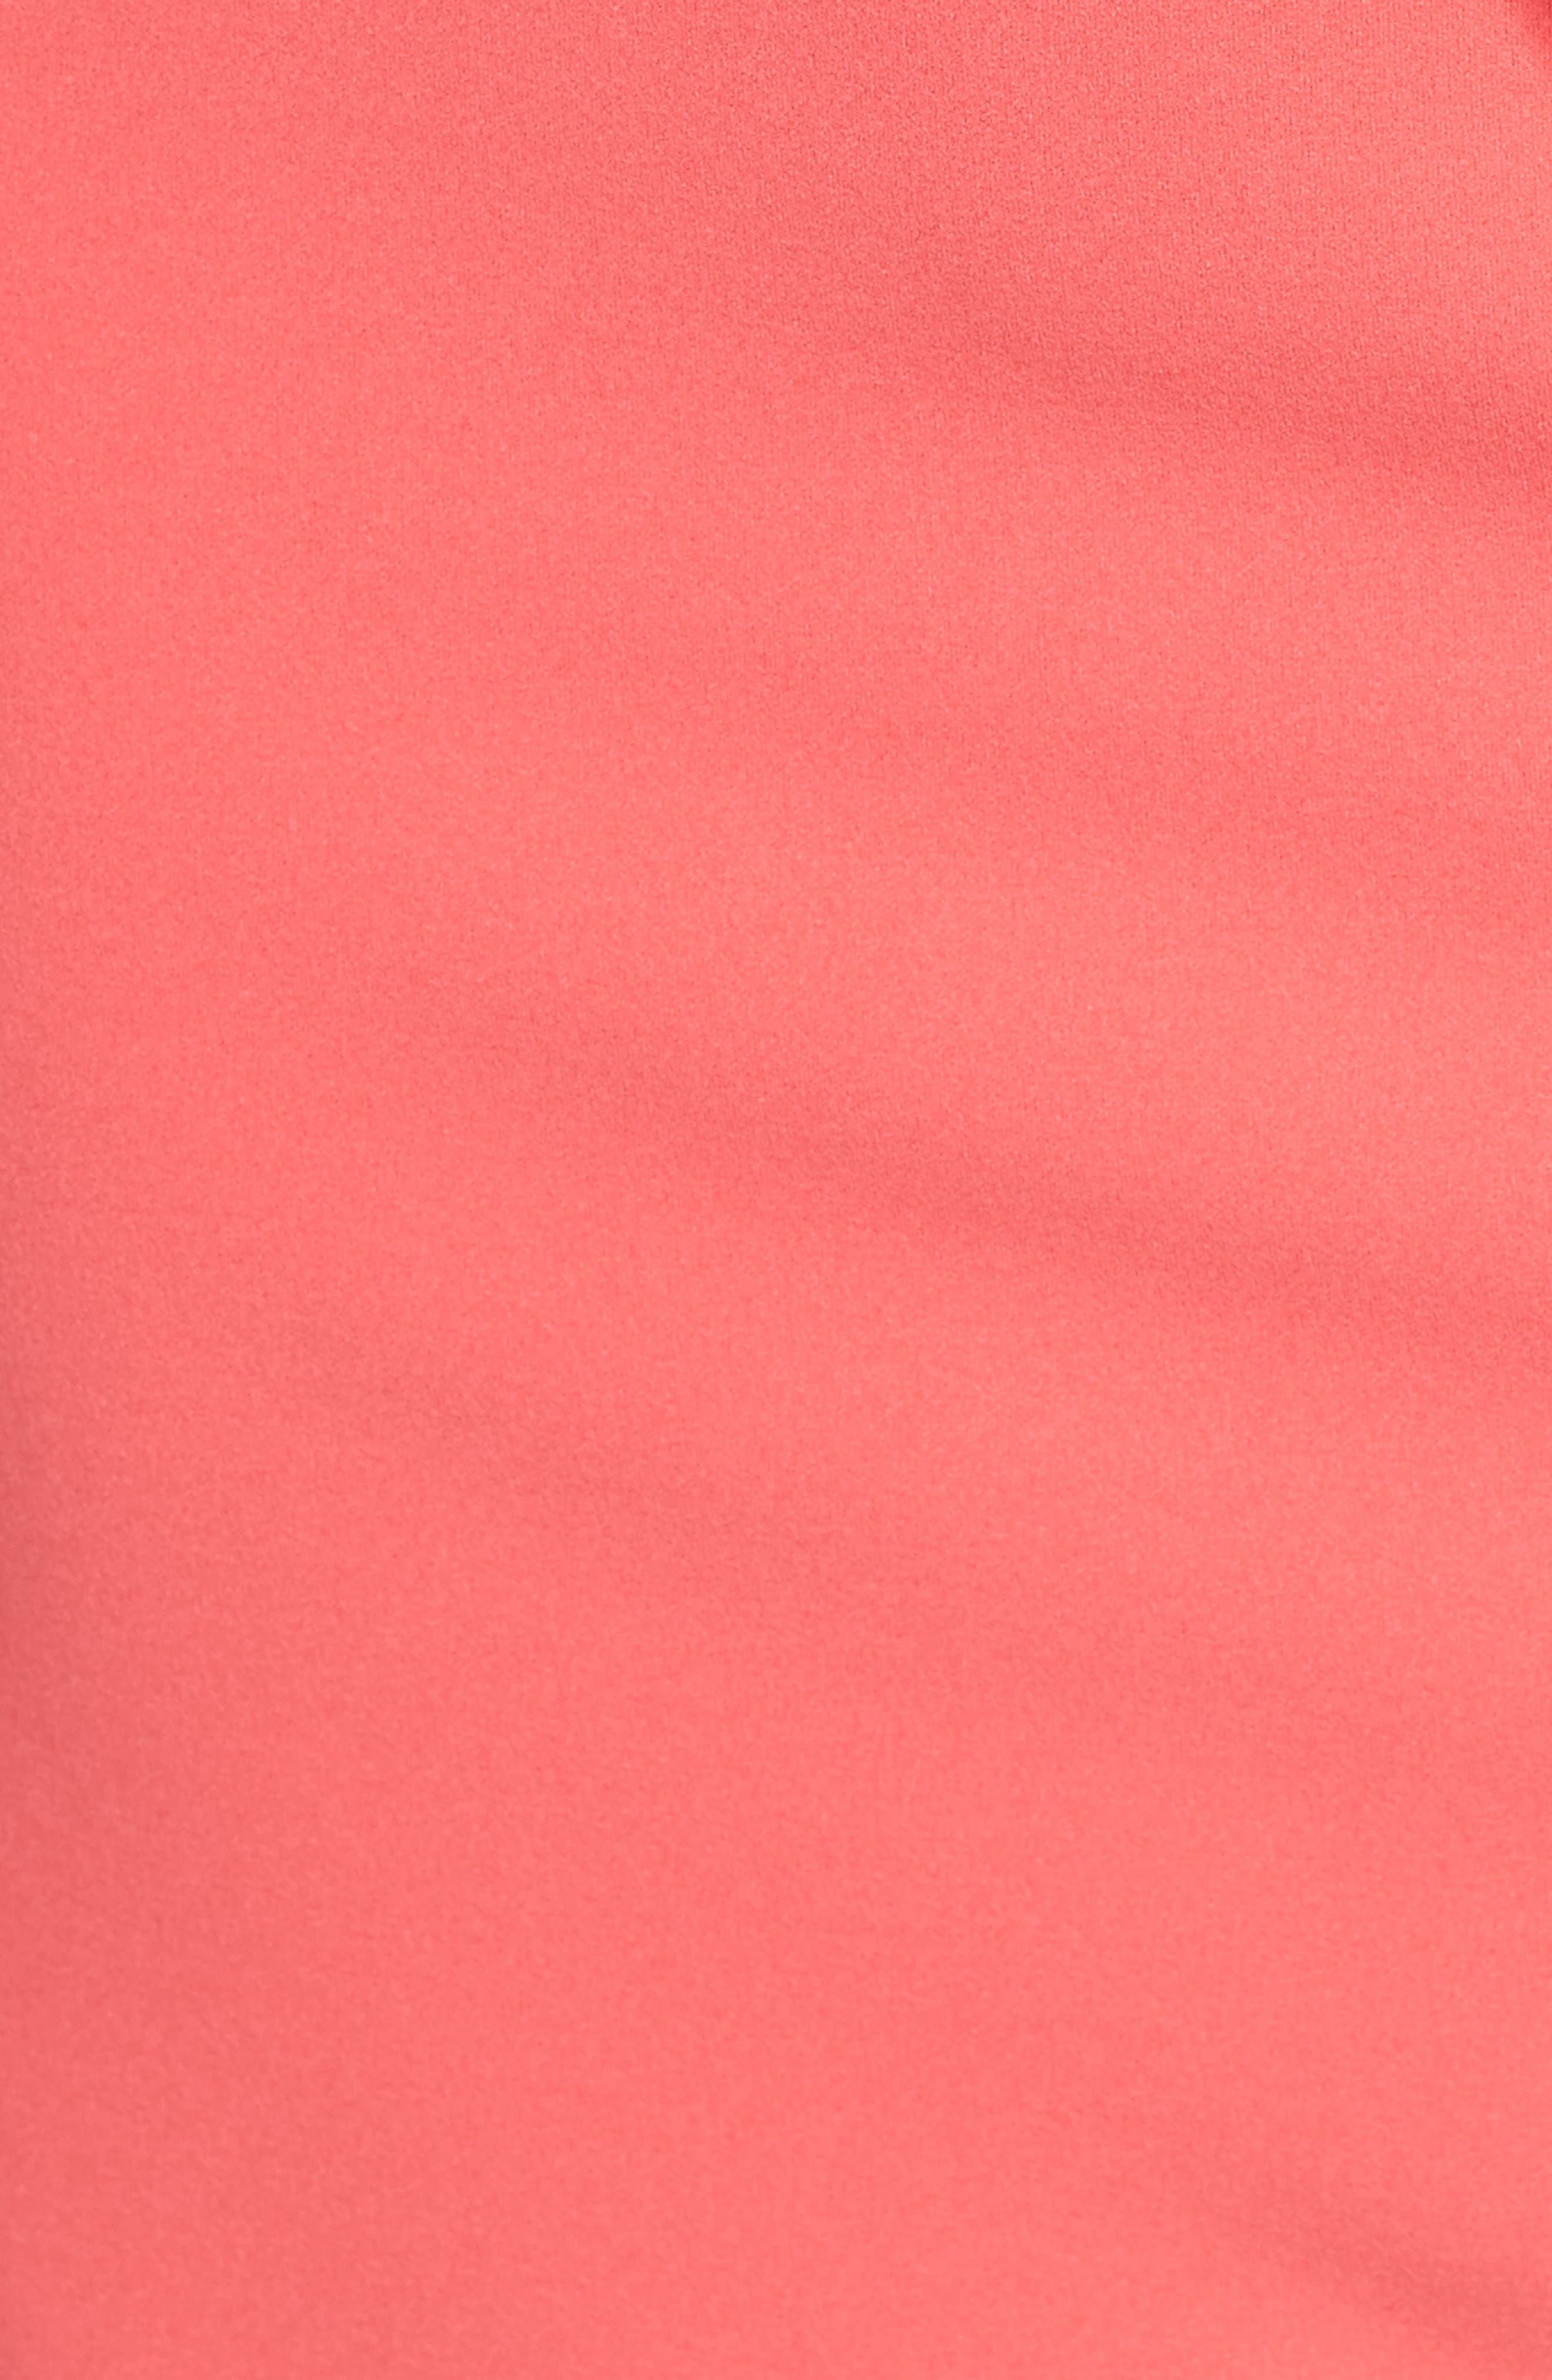 Roll Neck Crepe Dress,                             Alternate thumbnail 5, color,                             650